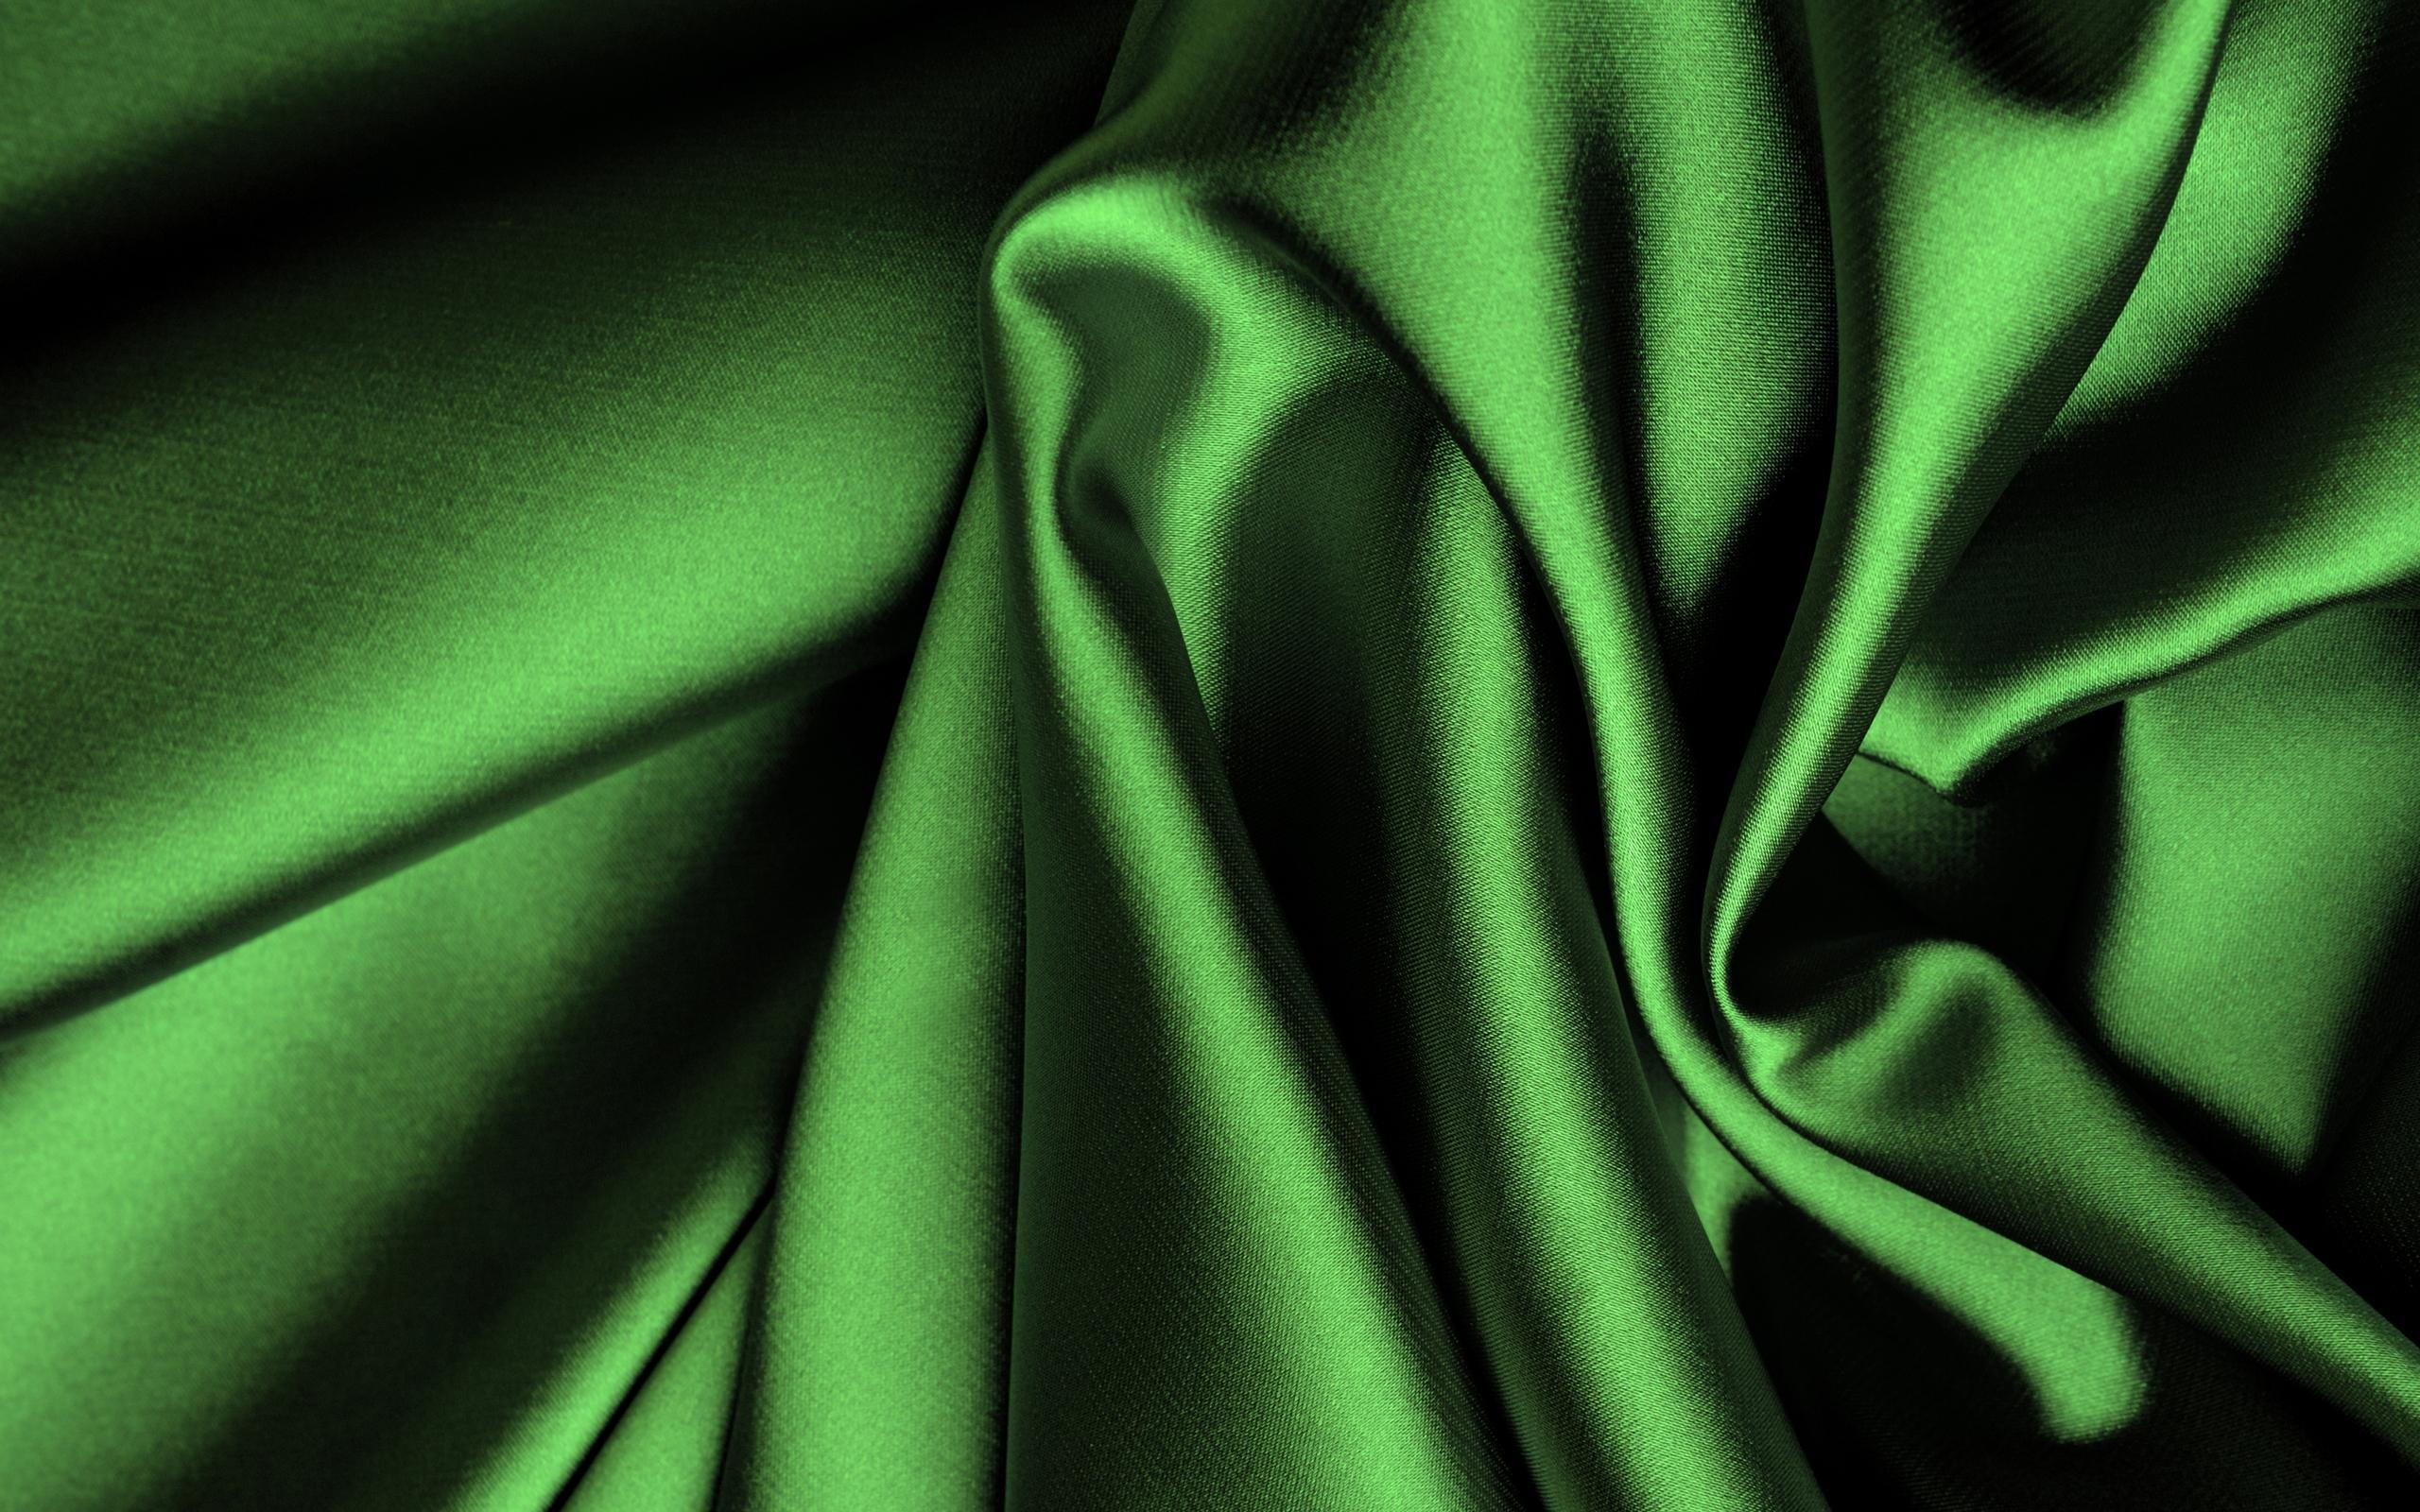 Texture Full HD Fond d'écran and Arrière-Plan | 2560x1600 | ID:352674